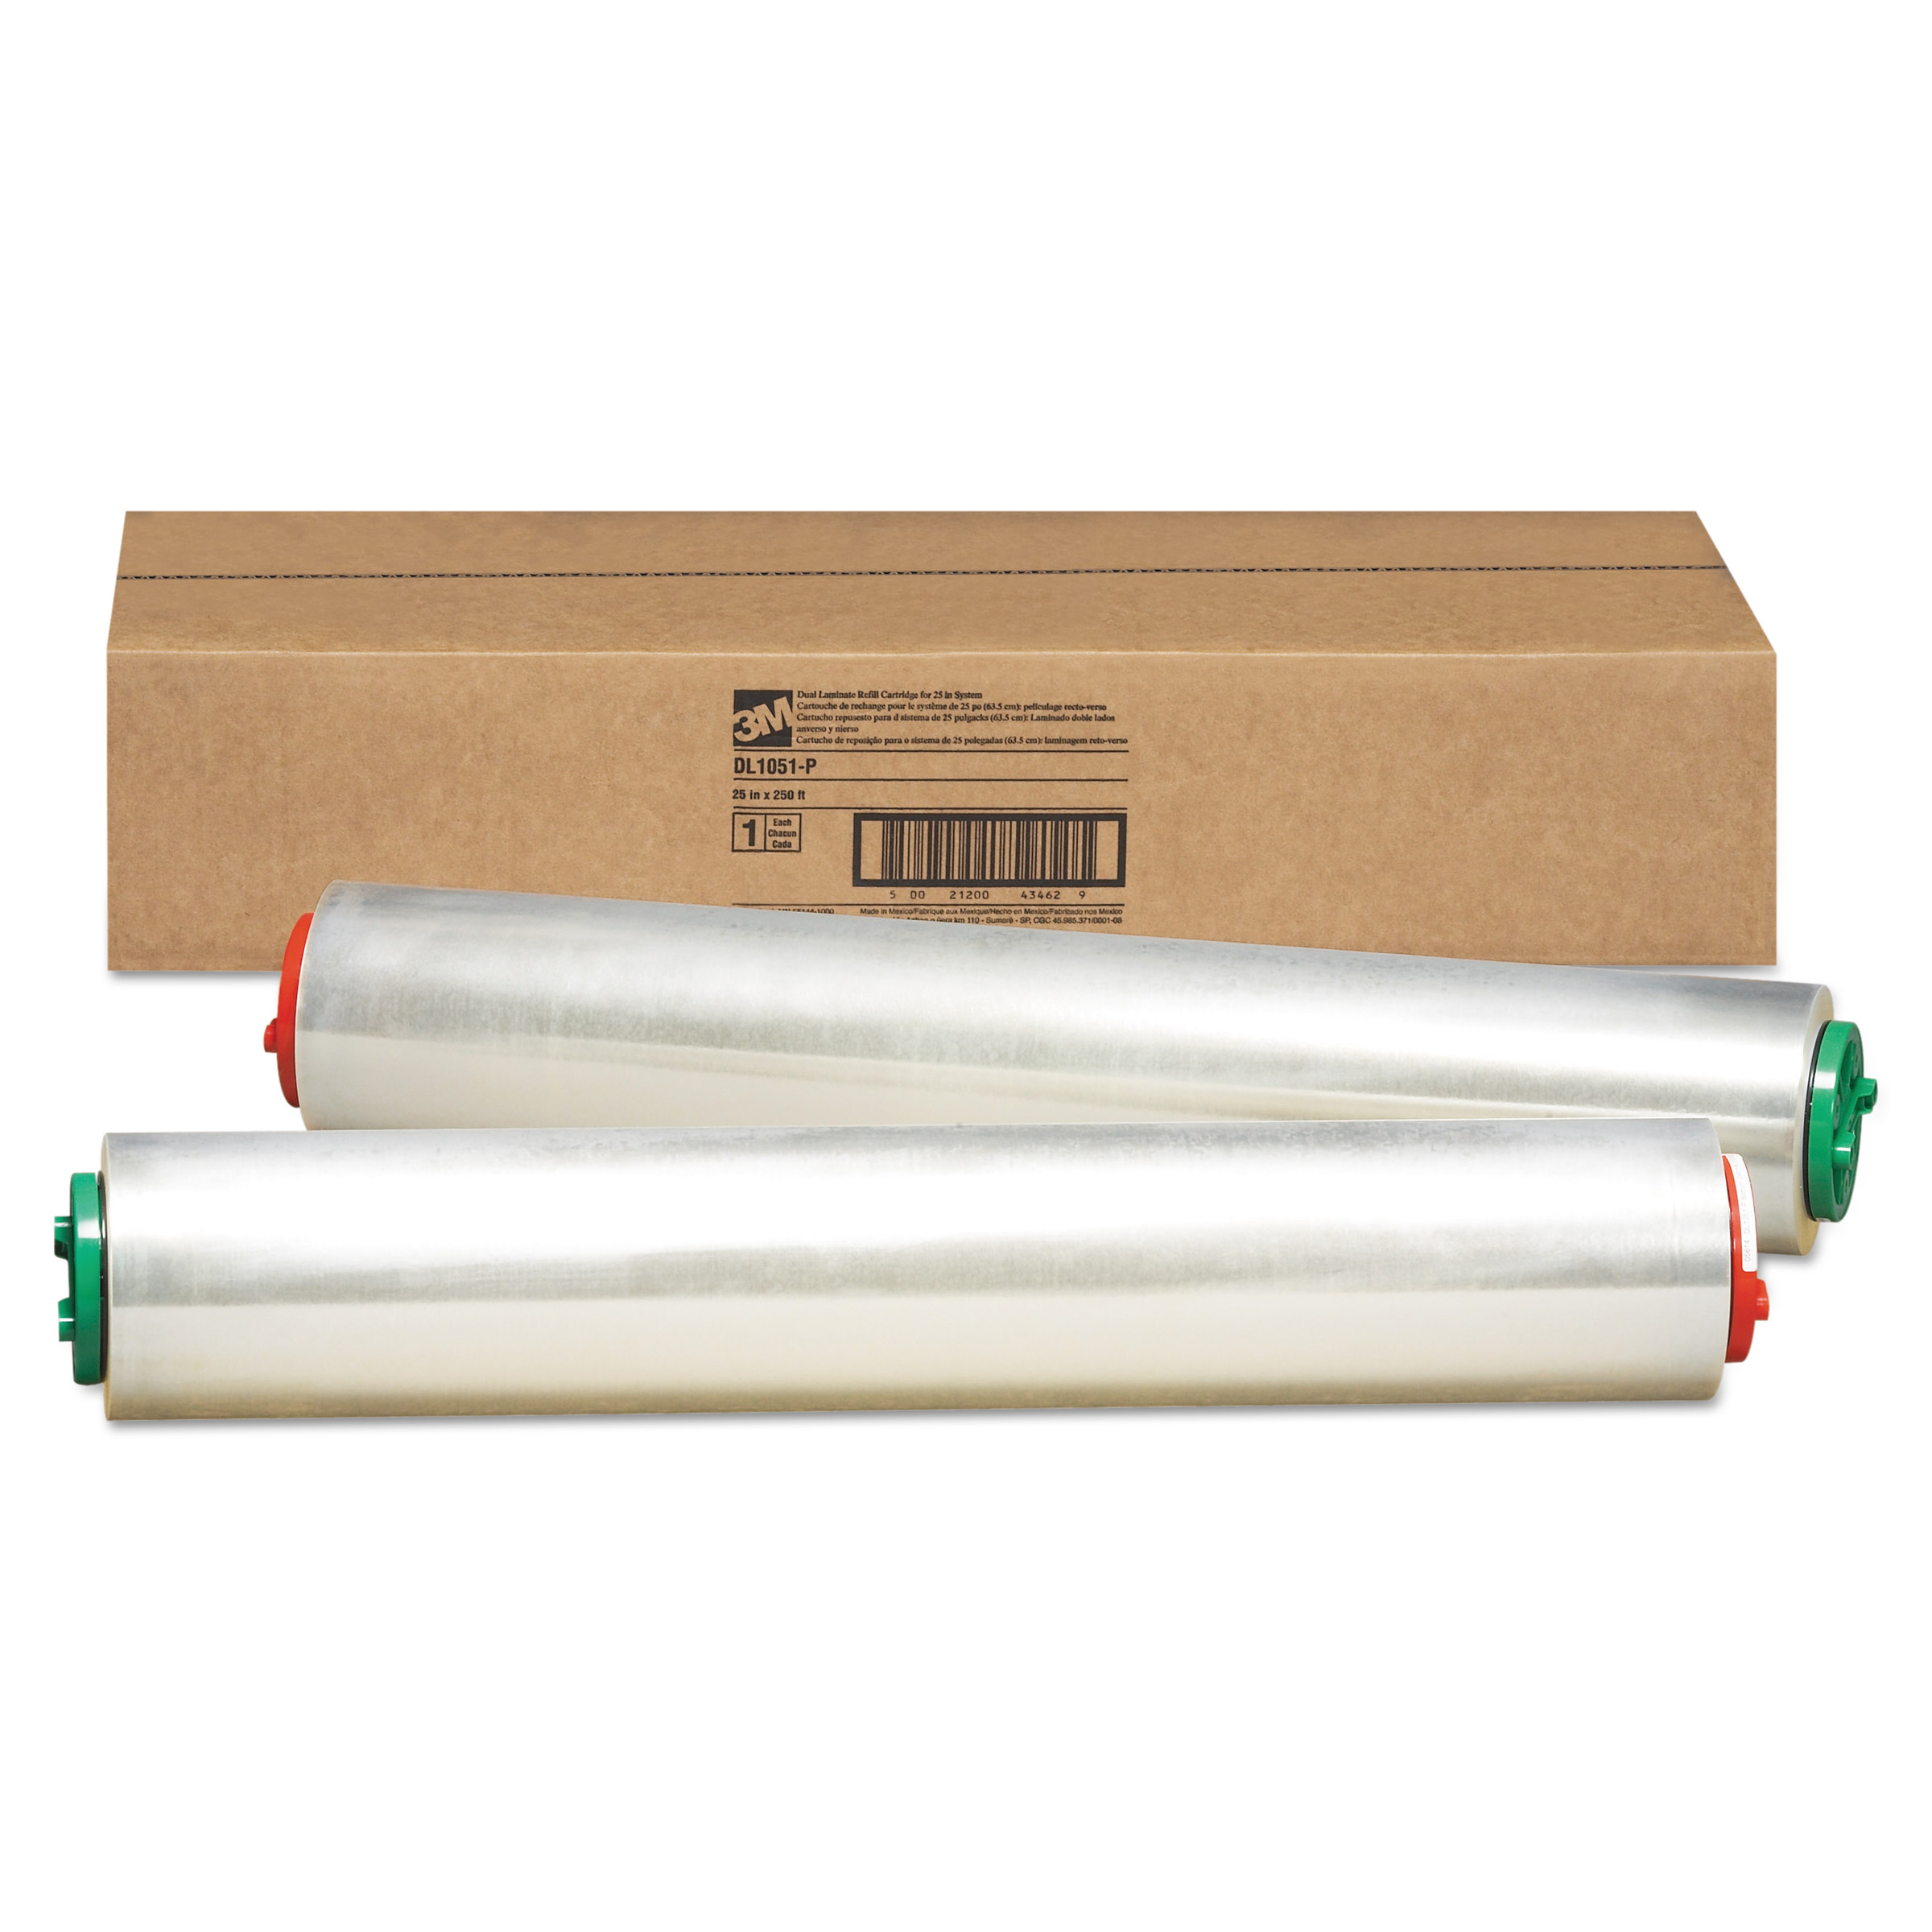 3M Refill Cartridge for Heat-Free Laminating Machines, 250 ft. -MMMDL1051P